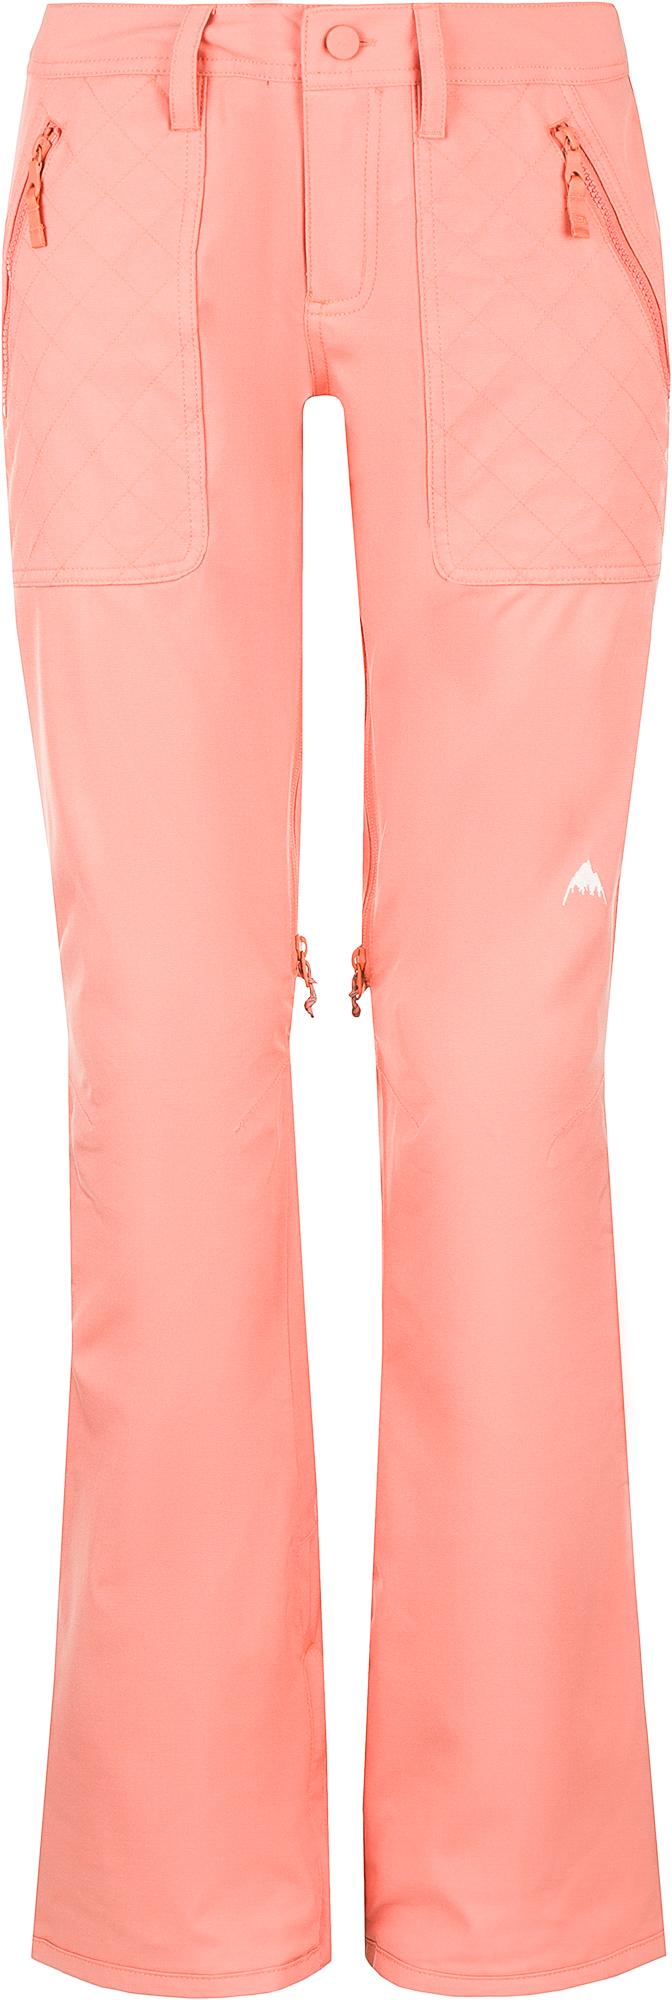 Burton Брюки женские Burton Vida, размер 46-48 цена 2017